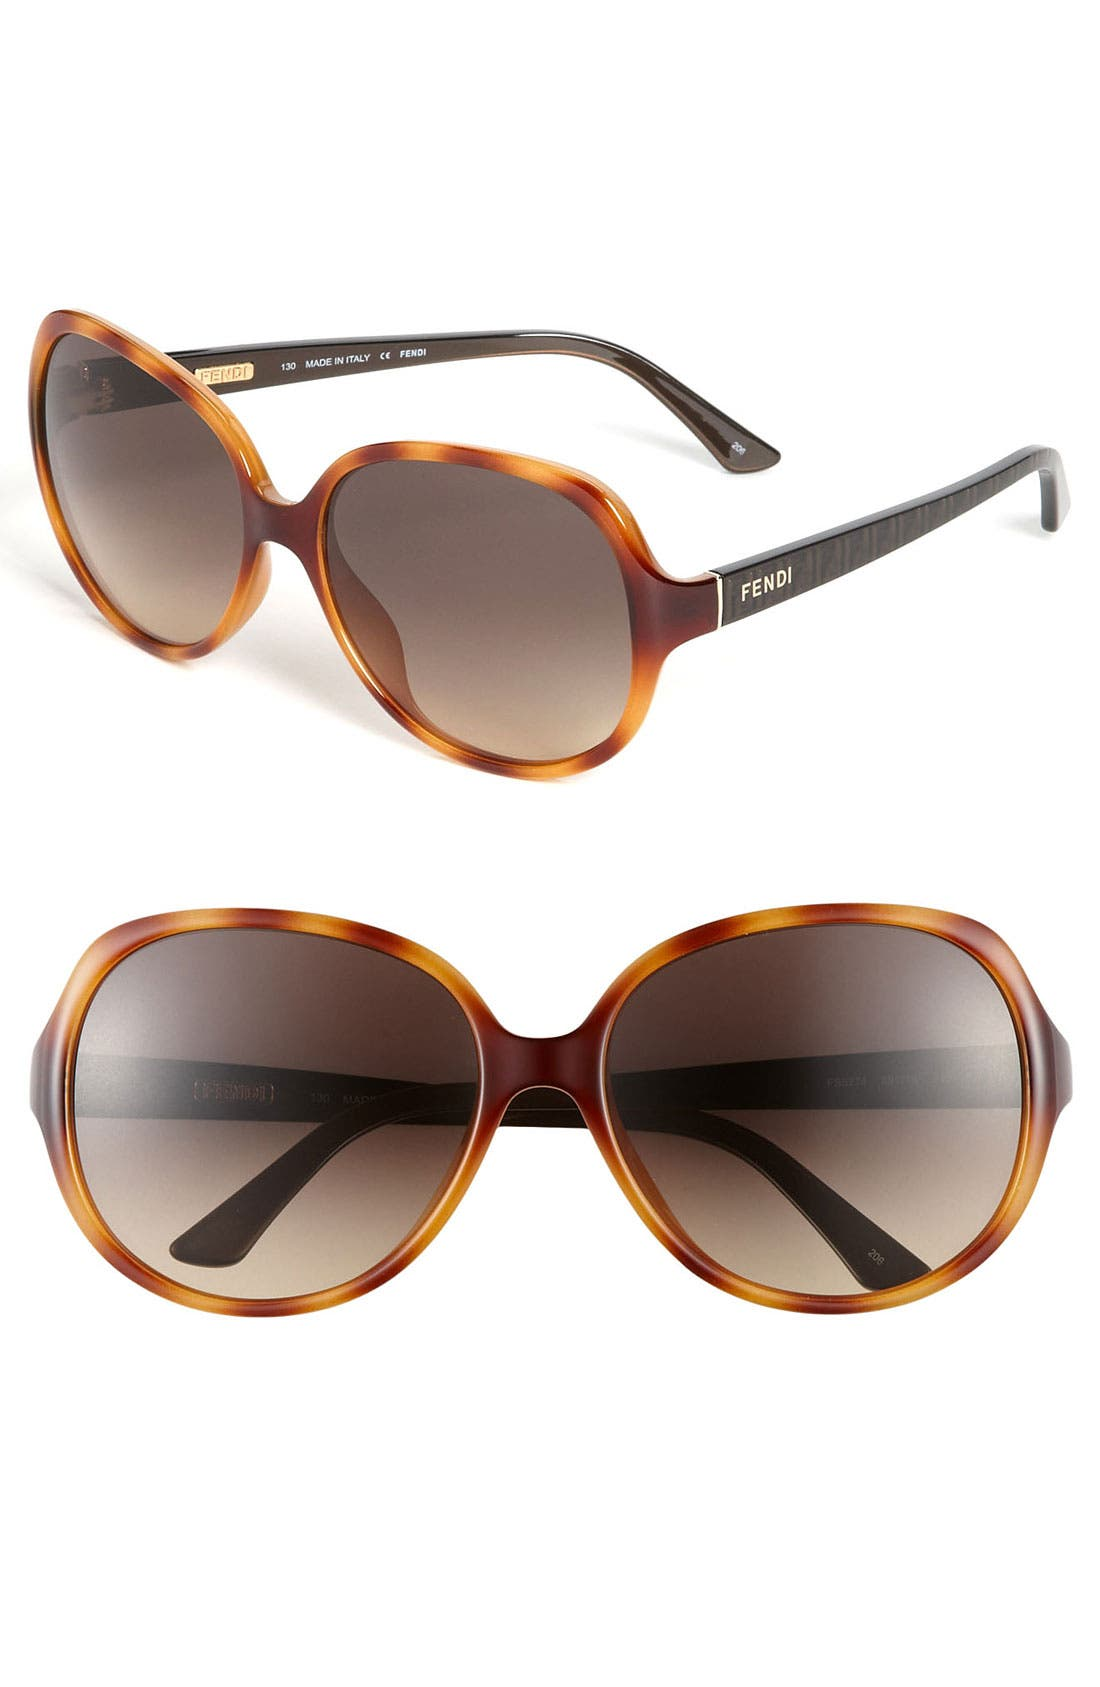 Main Image - Fendi 59mm Sunglasses